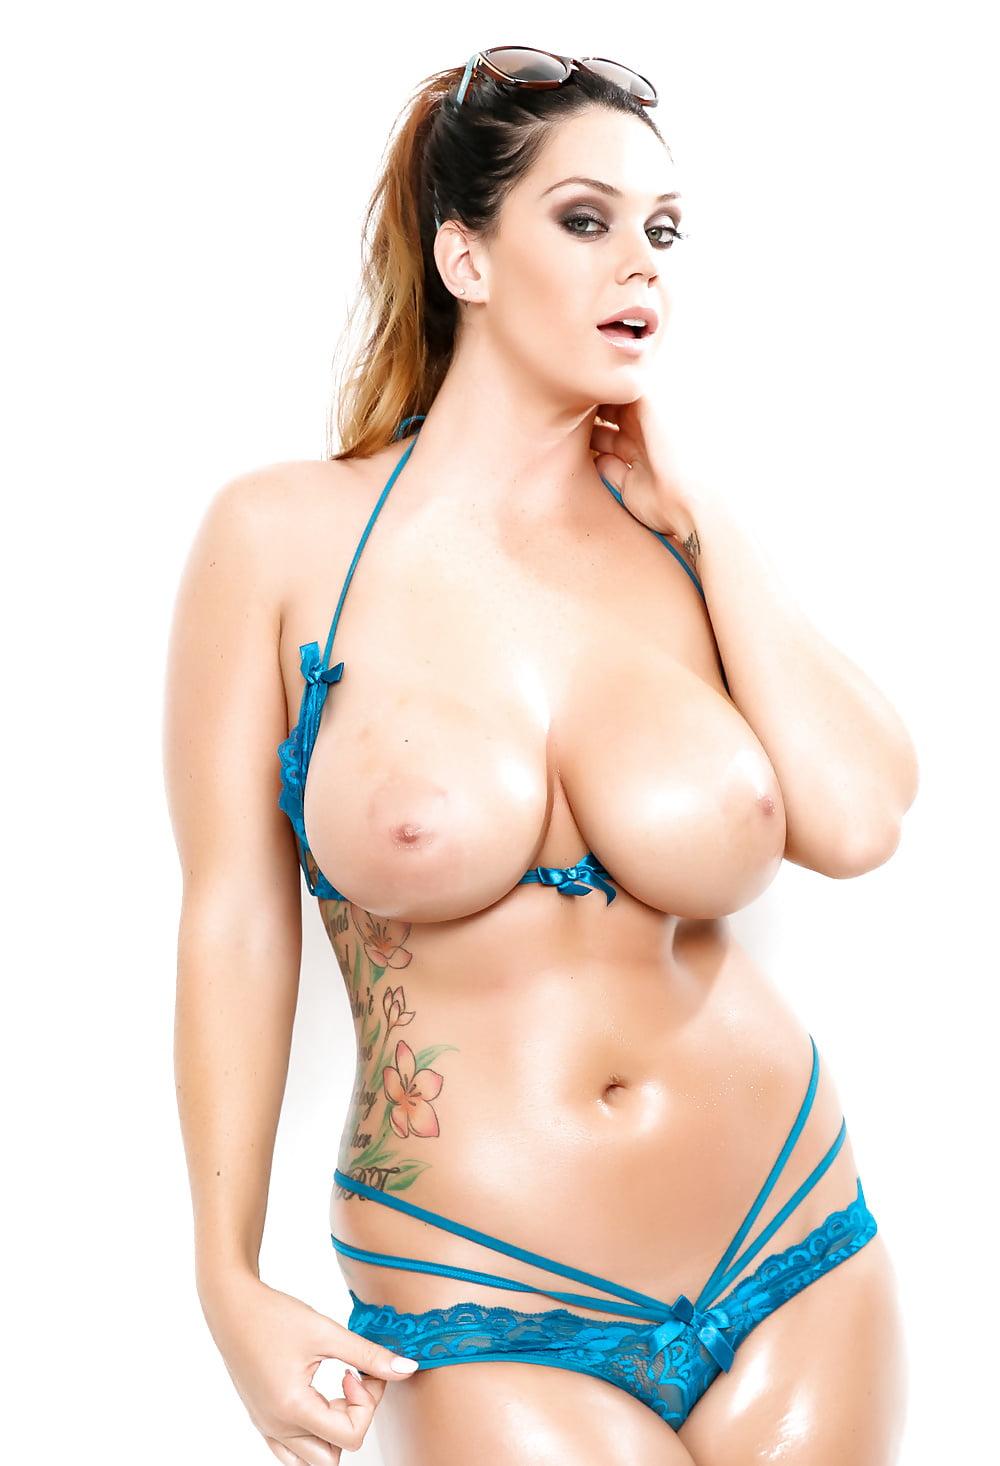 alison-teal-porno-nice-naked-valva